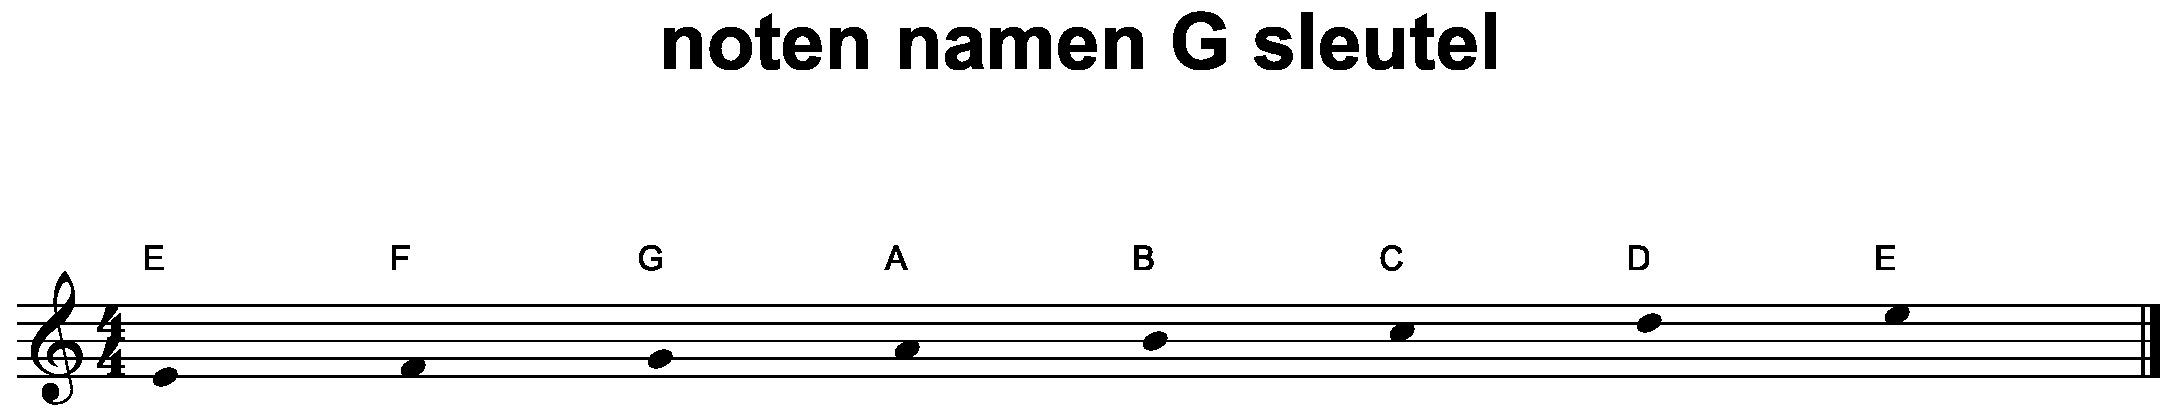 Theorieboek notennamen G sleutel